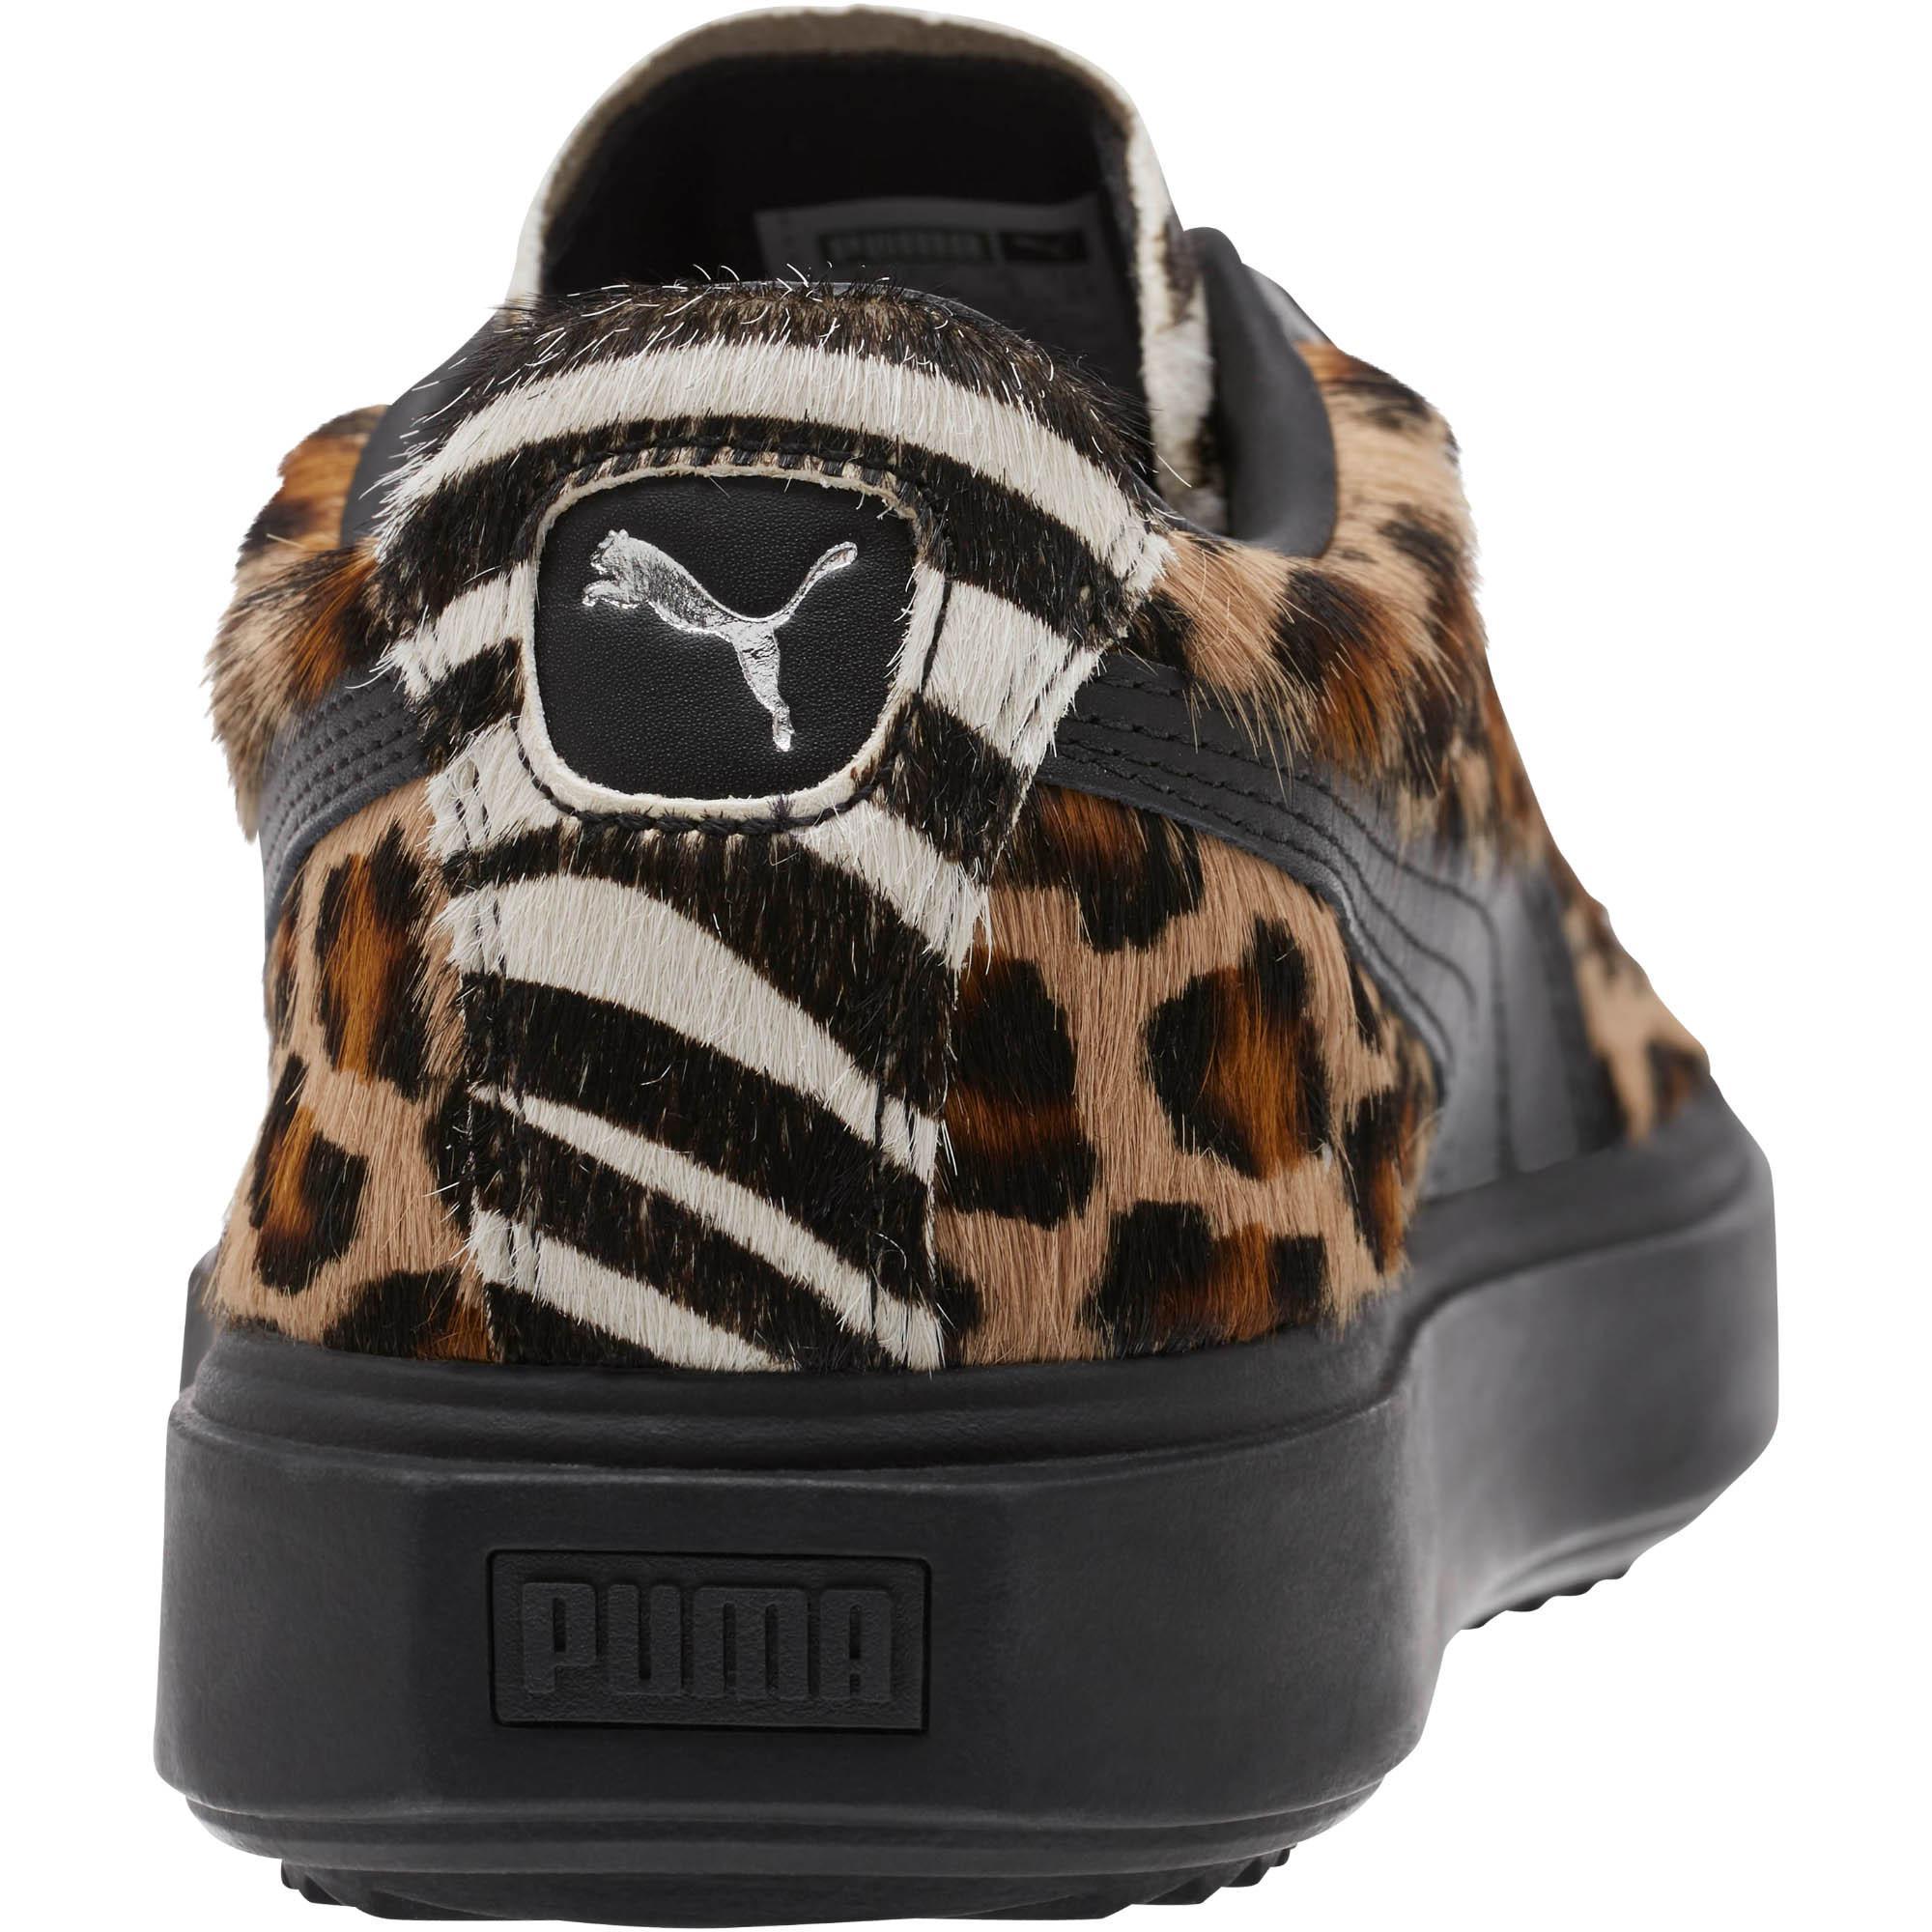 superior quality 13b7d 63c8a Black X Paul Stanley Breaker Men's Sneakers